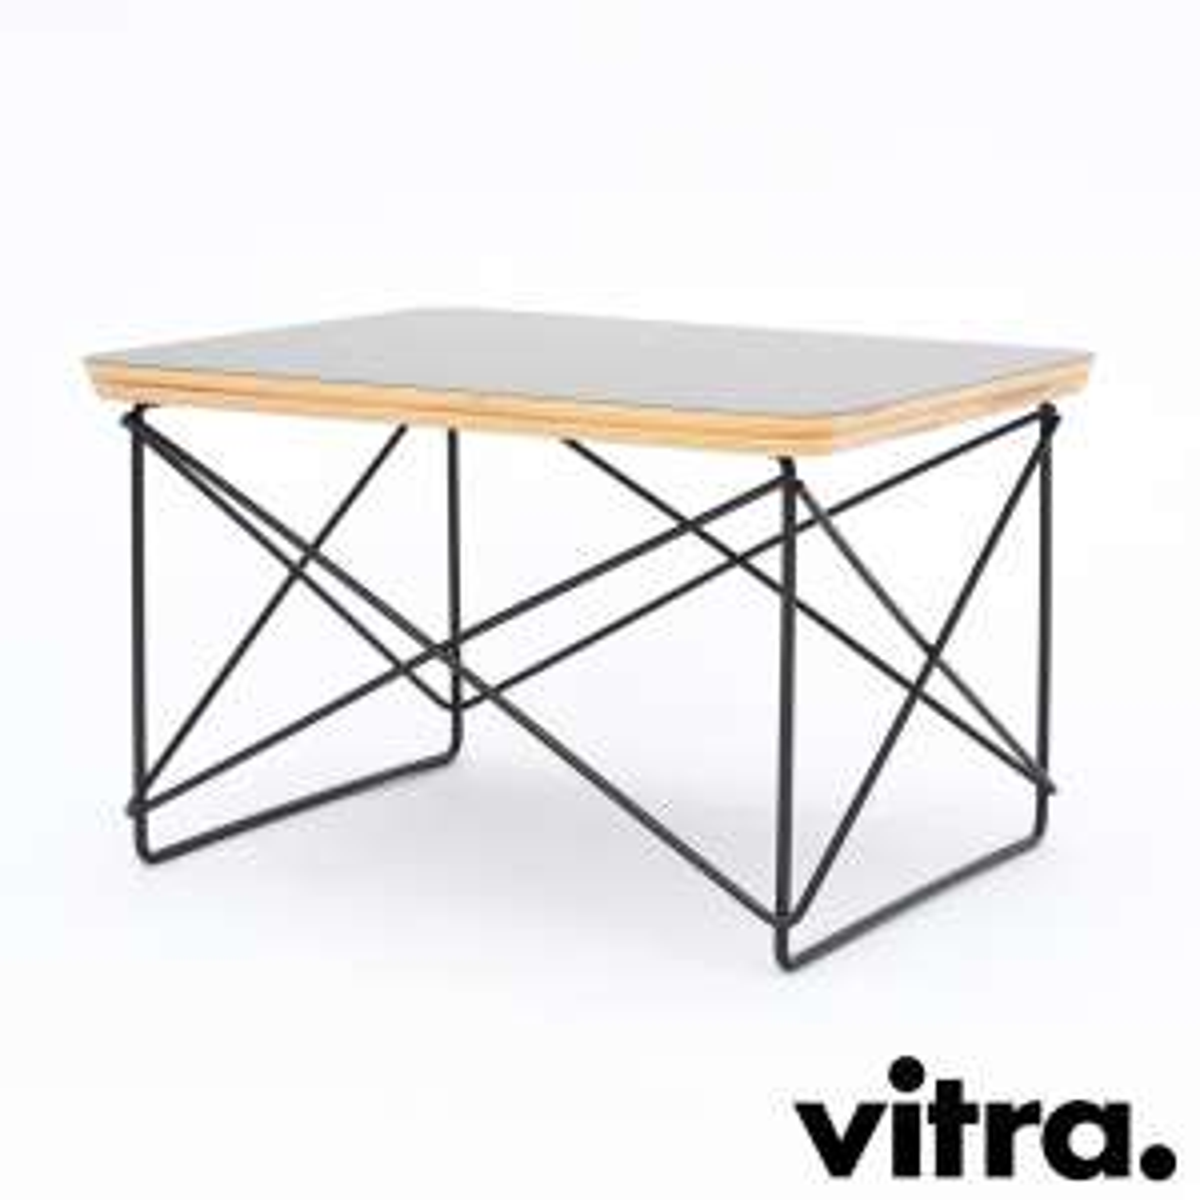 Design merk VITRA 30% bij Hudson Bay